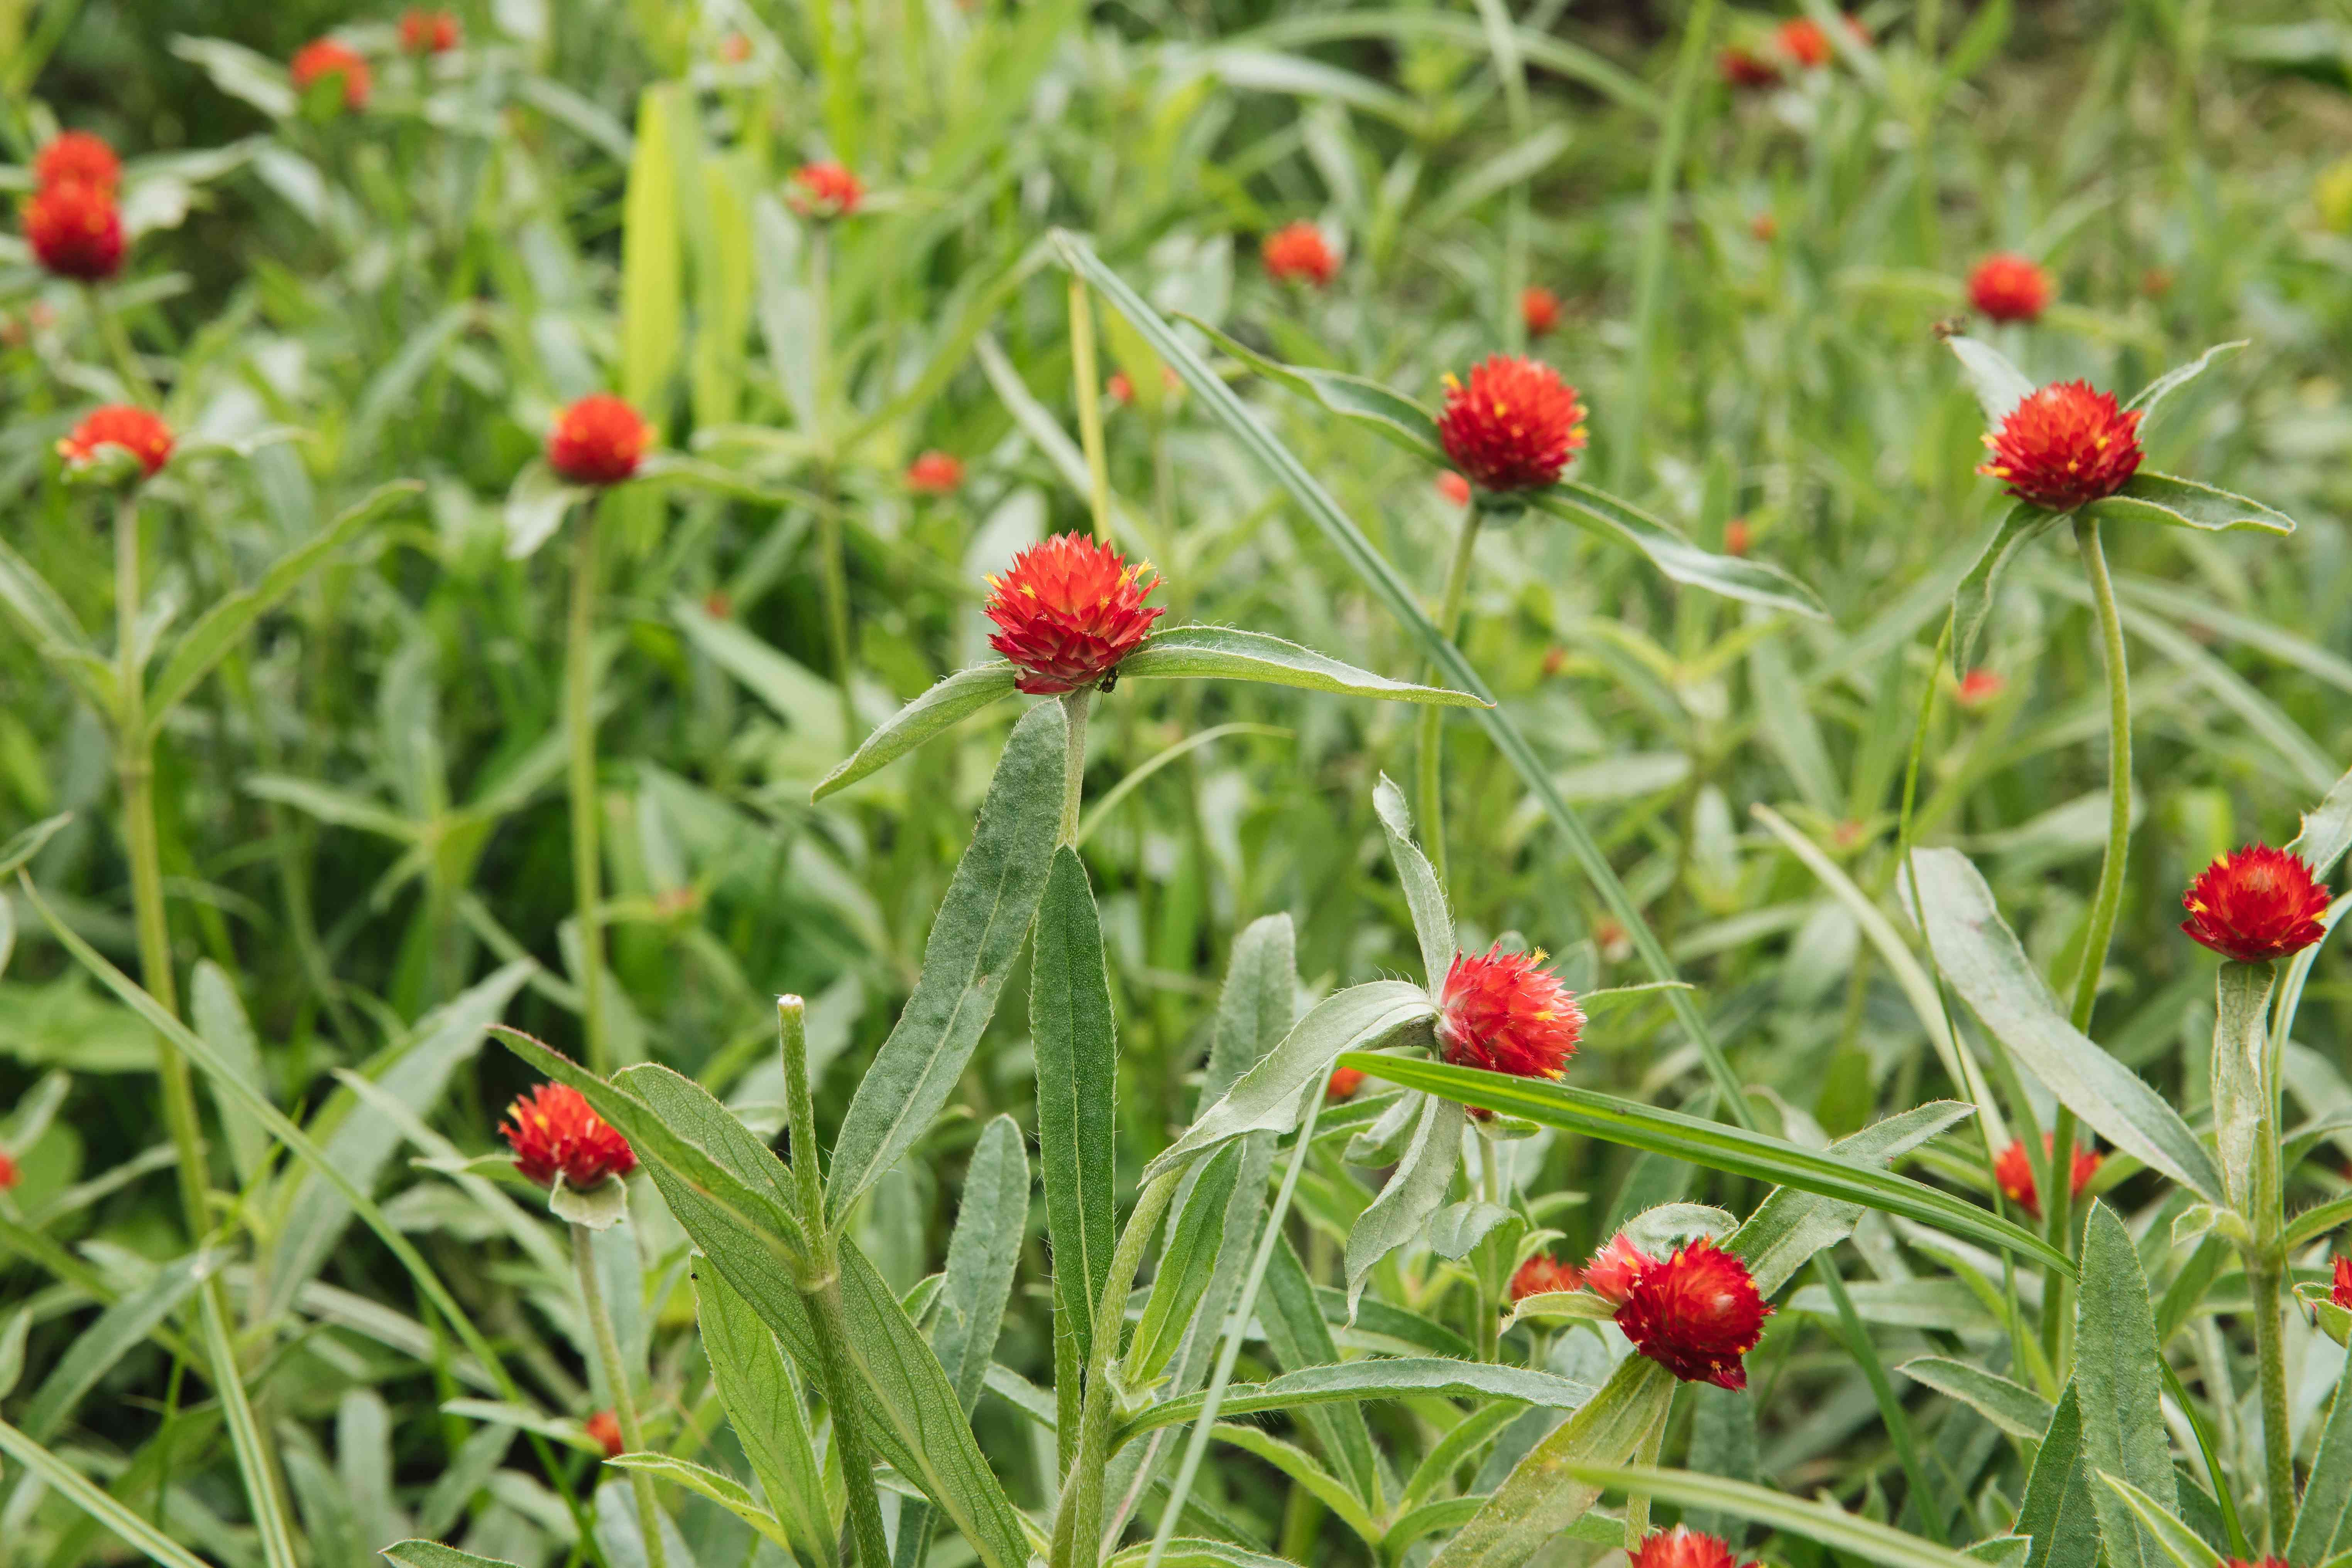 red globe amaranth